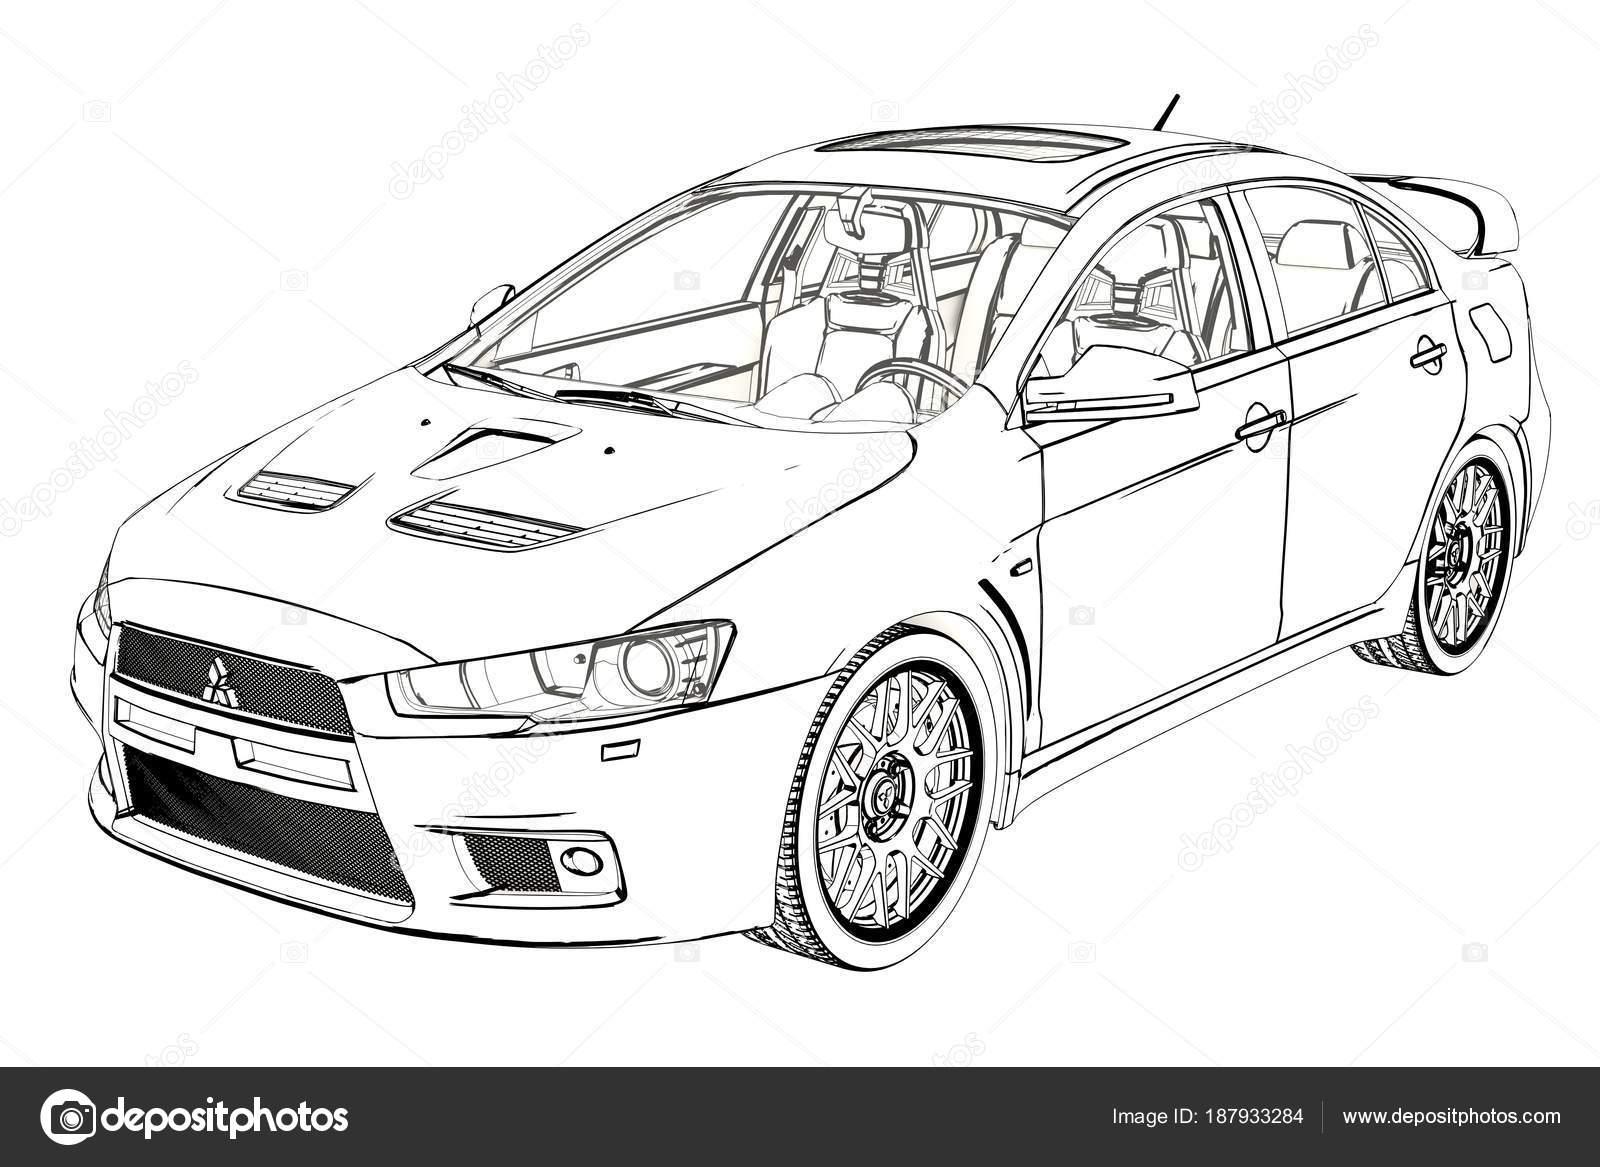 Berline Mitsubishi Evolution X croquis. illustration 3D